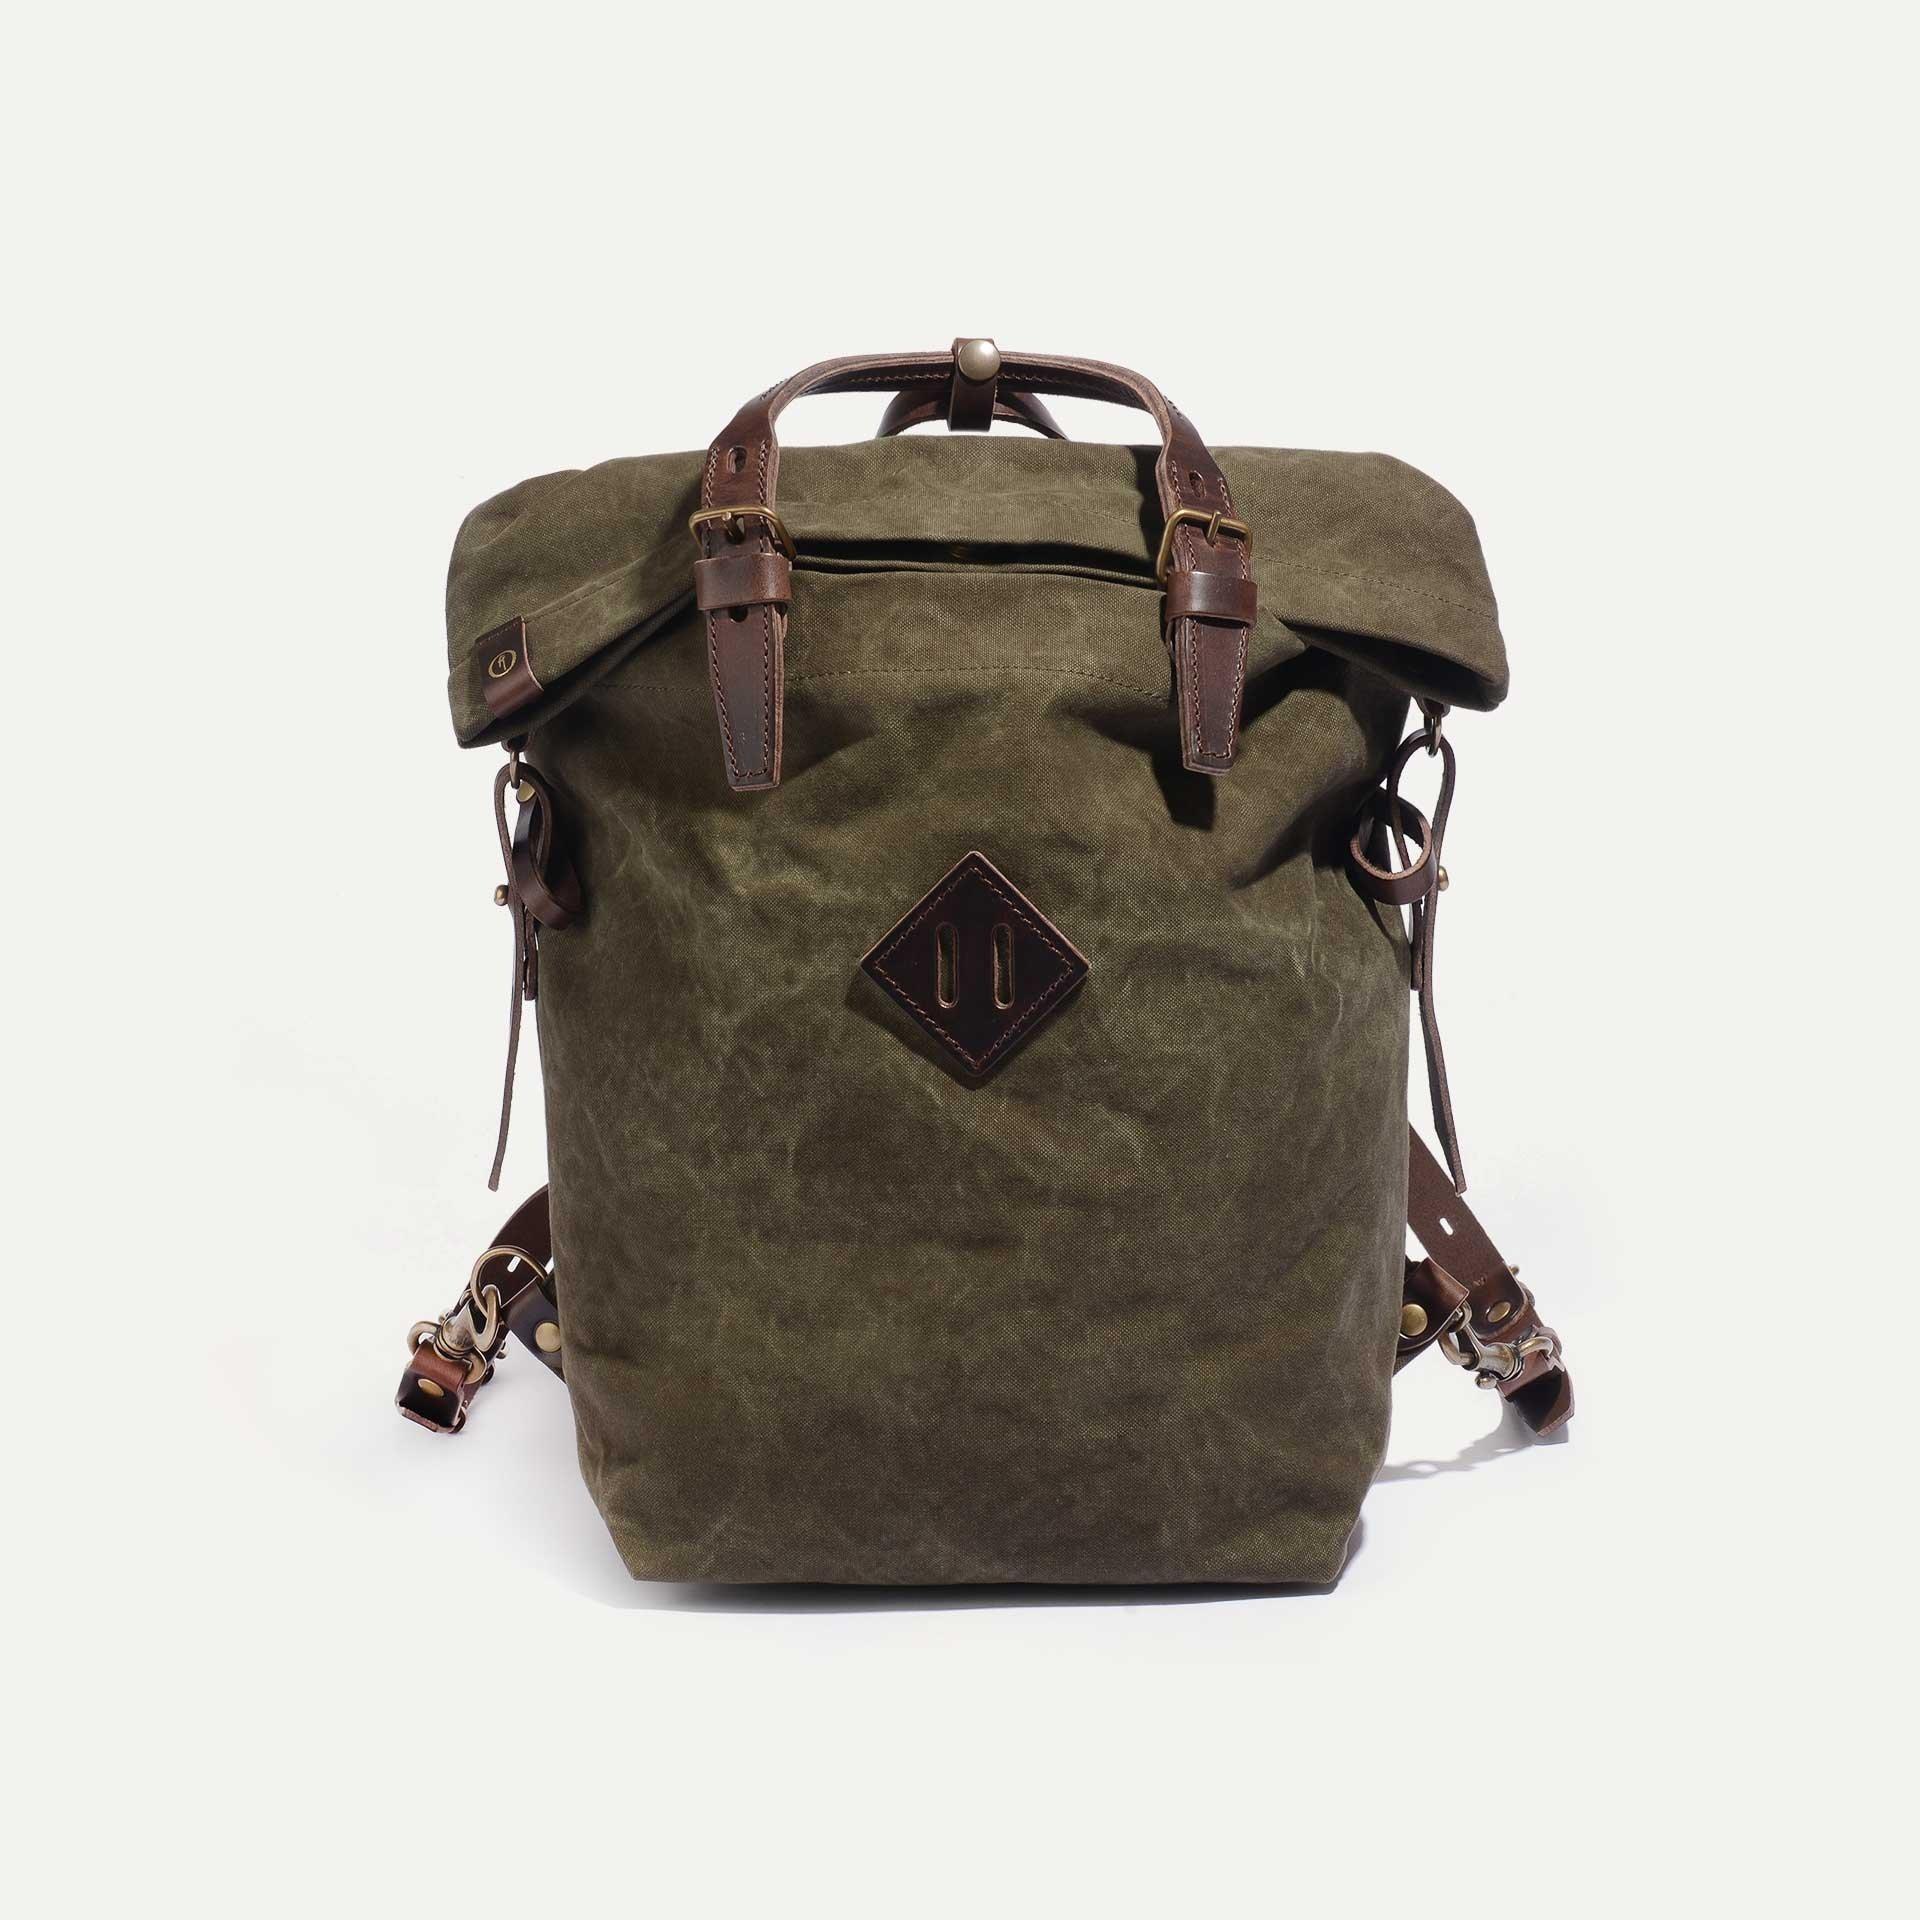 Woody S Backpack - Dark Khaki  (image n°1)